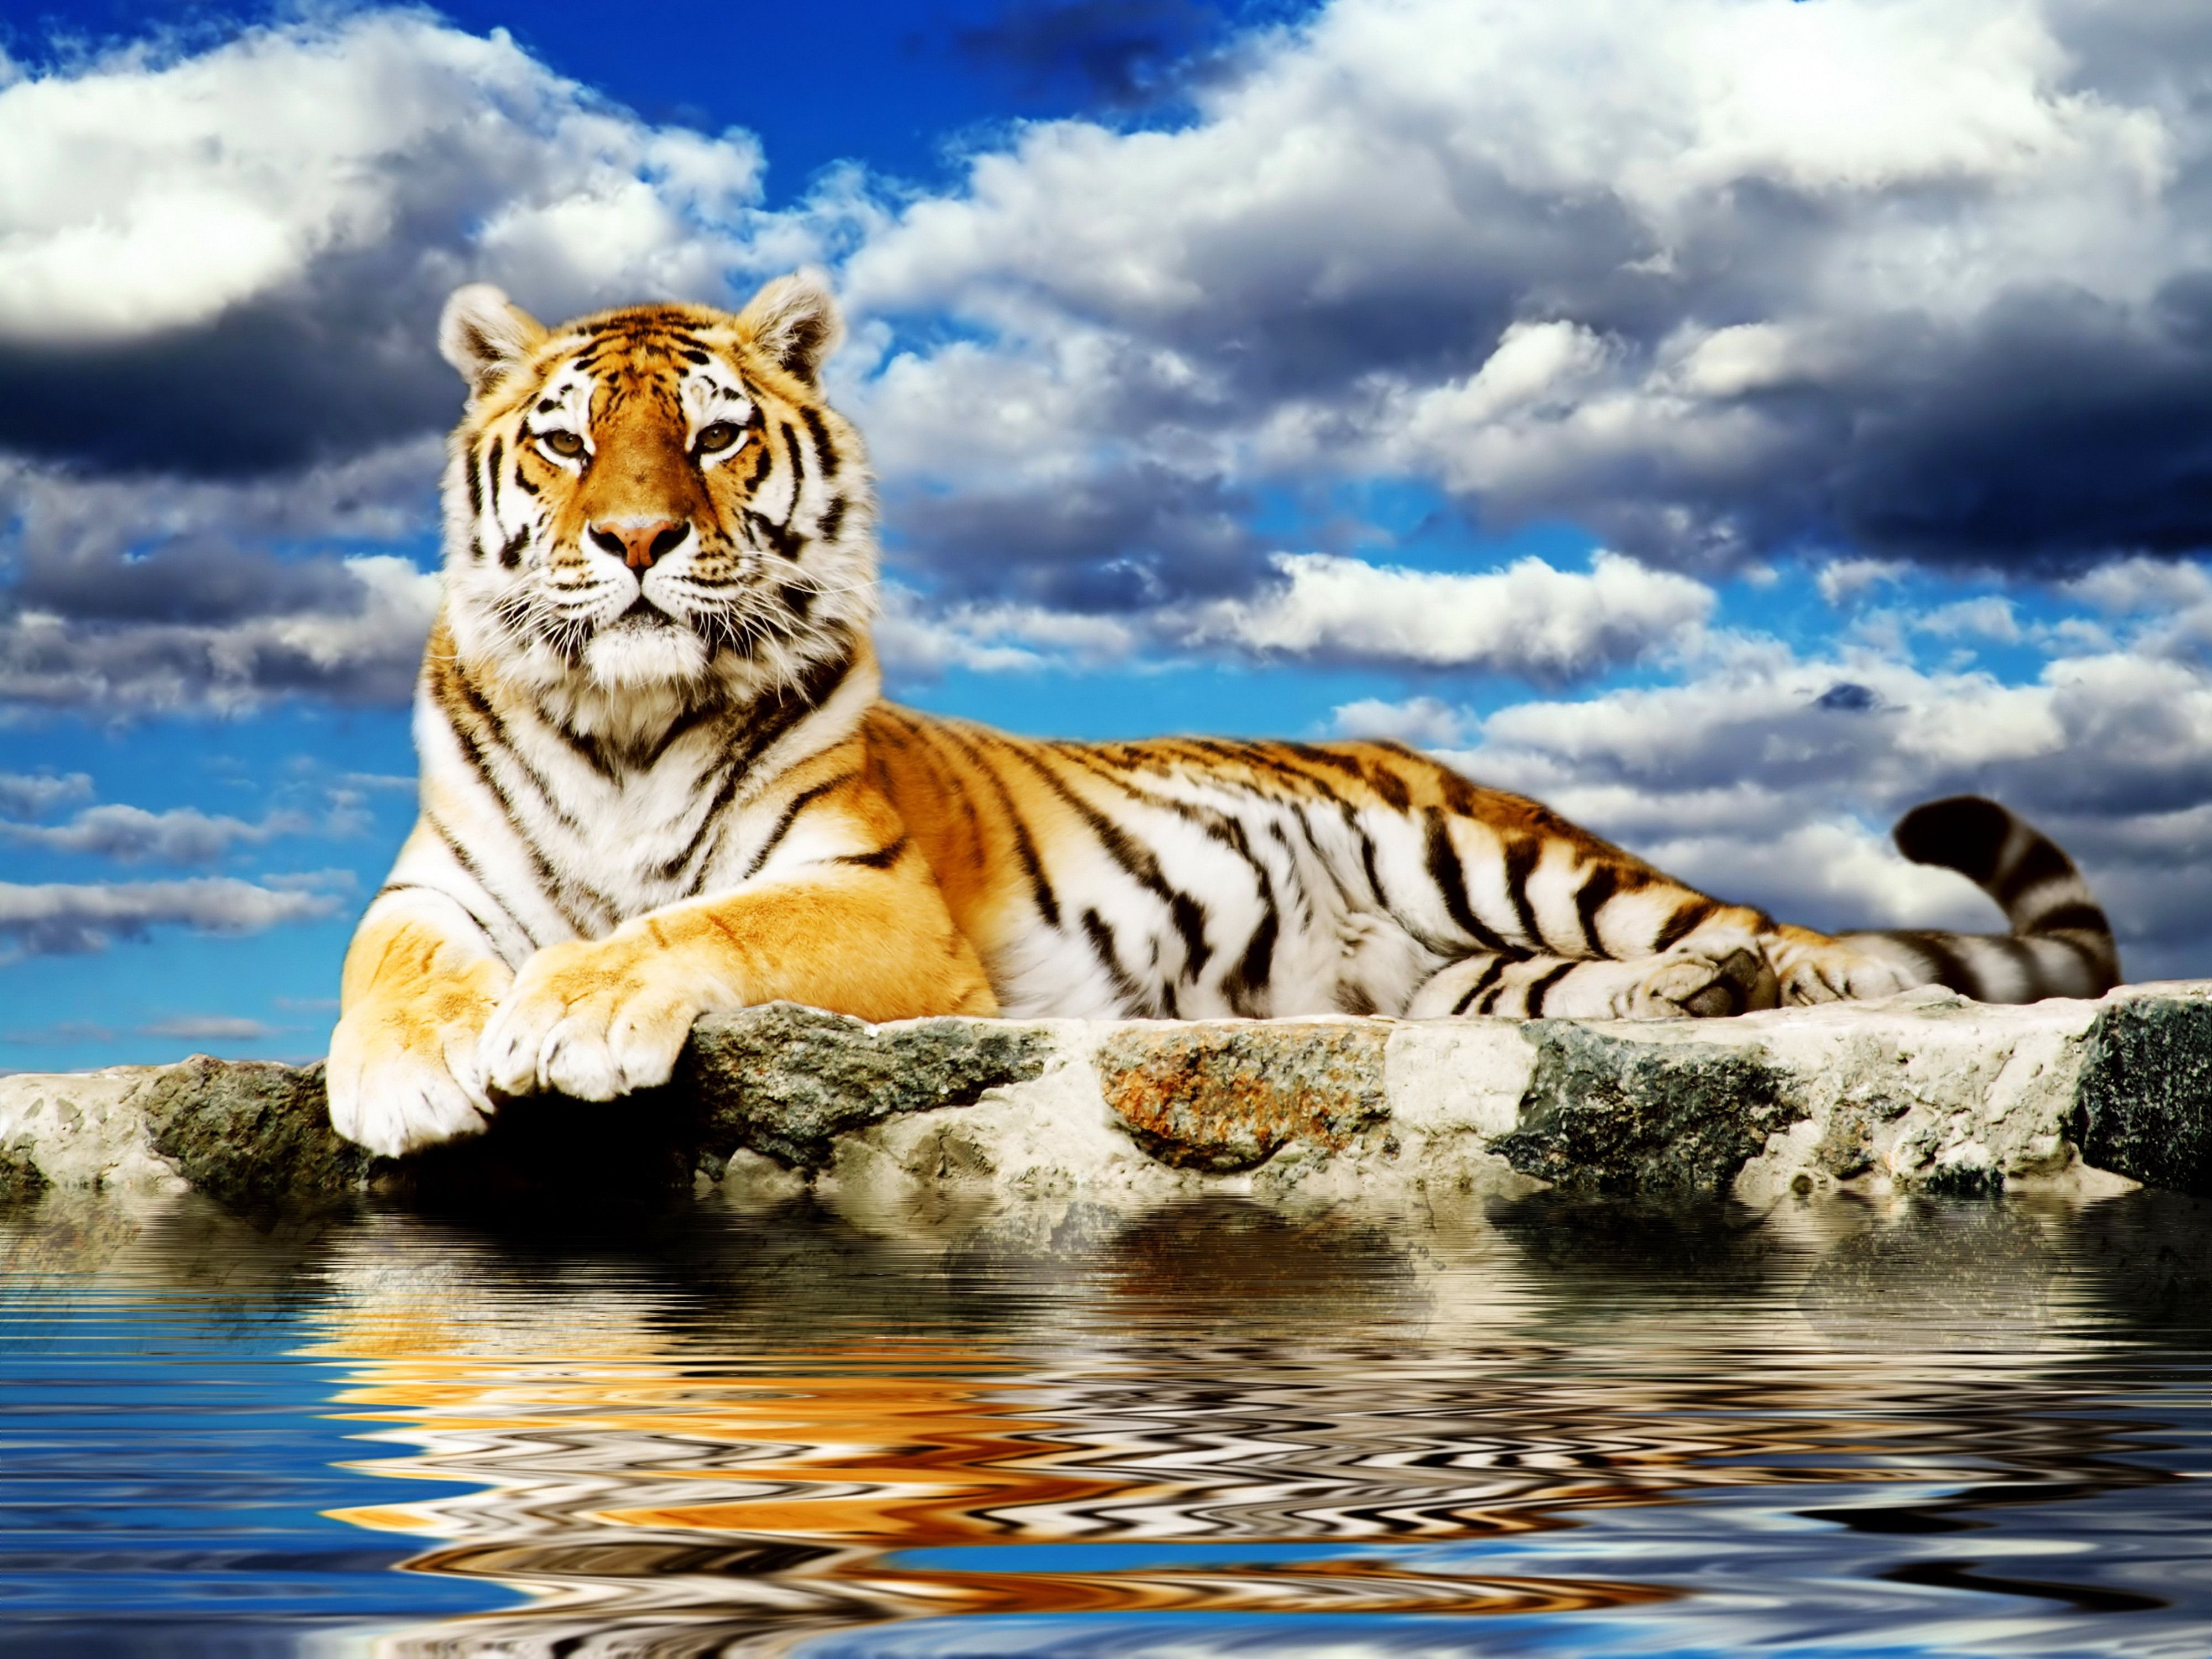 Majestic Tiger Desktop Background wallpaper free   Tigers ...